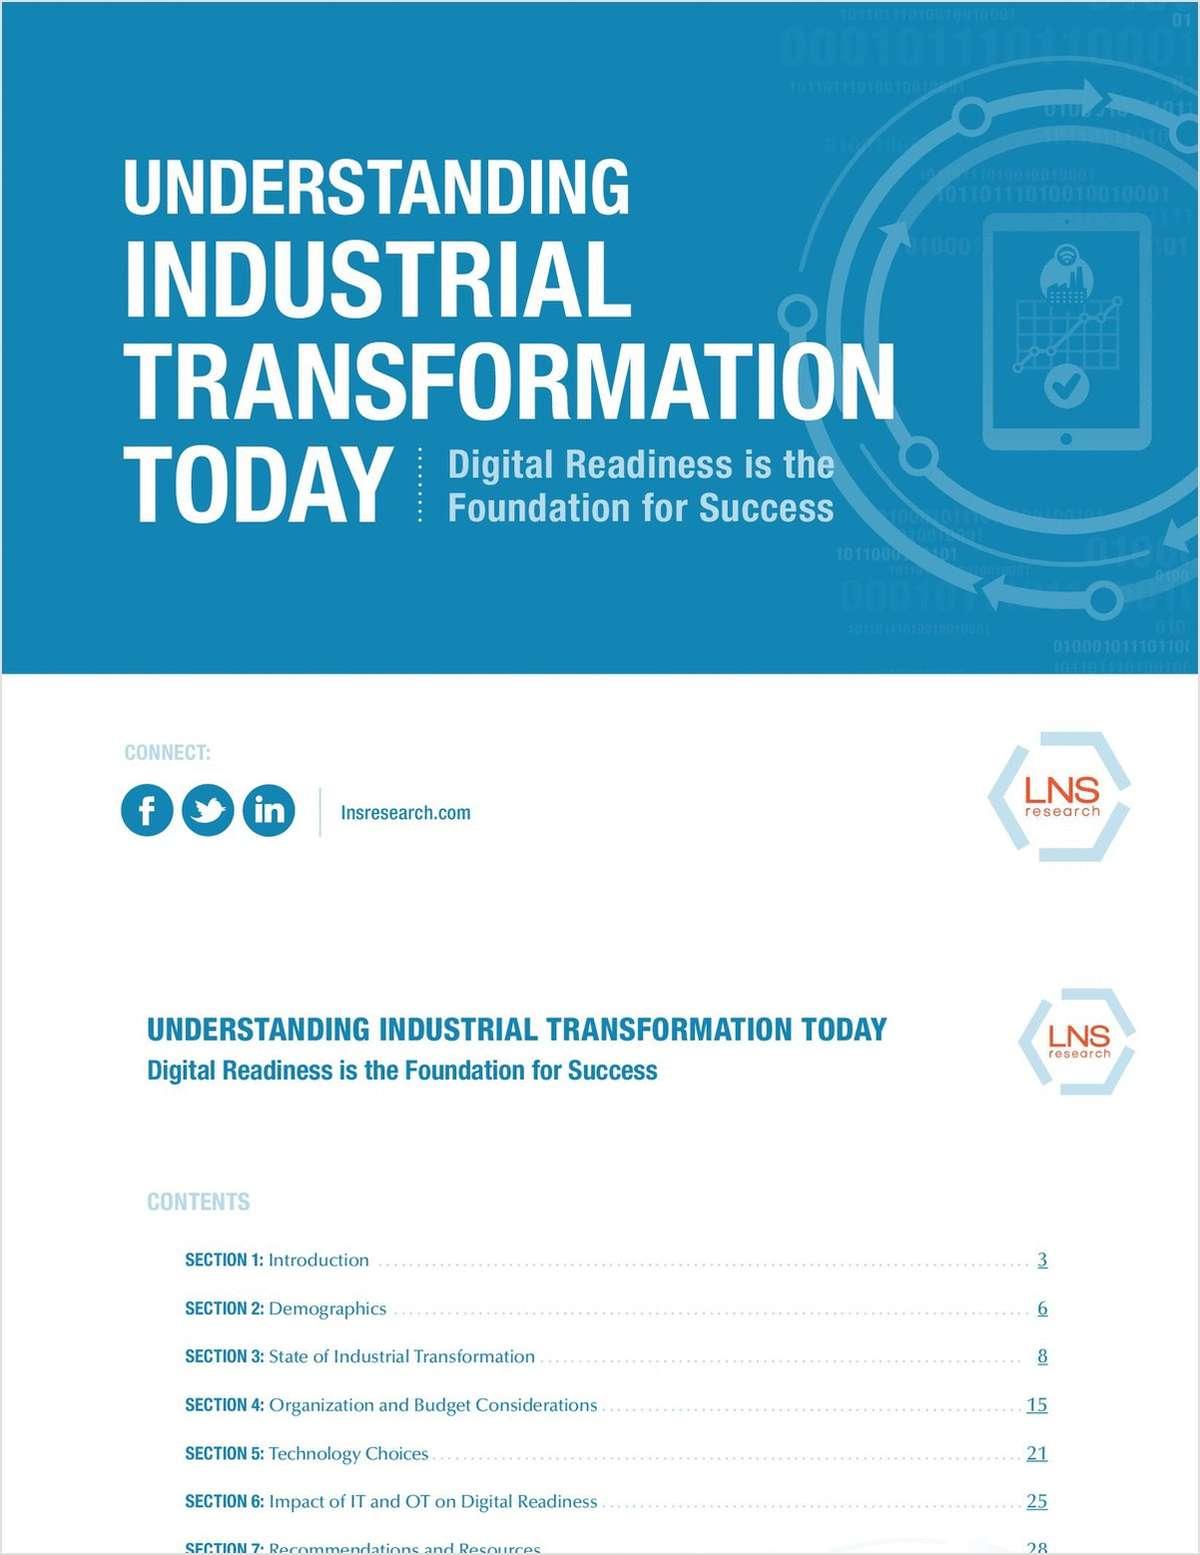 Understanding the Industrial Transformation Today